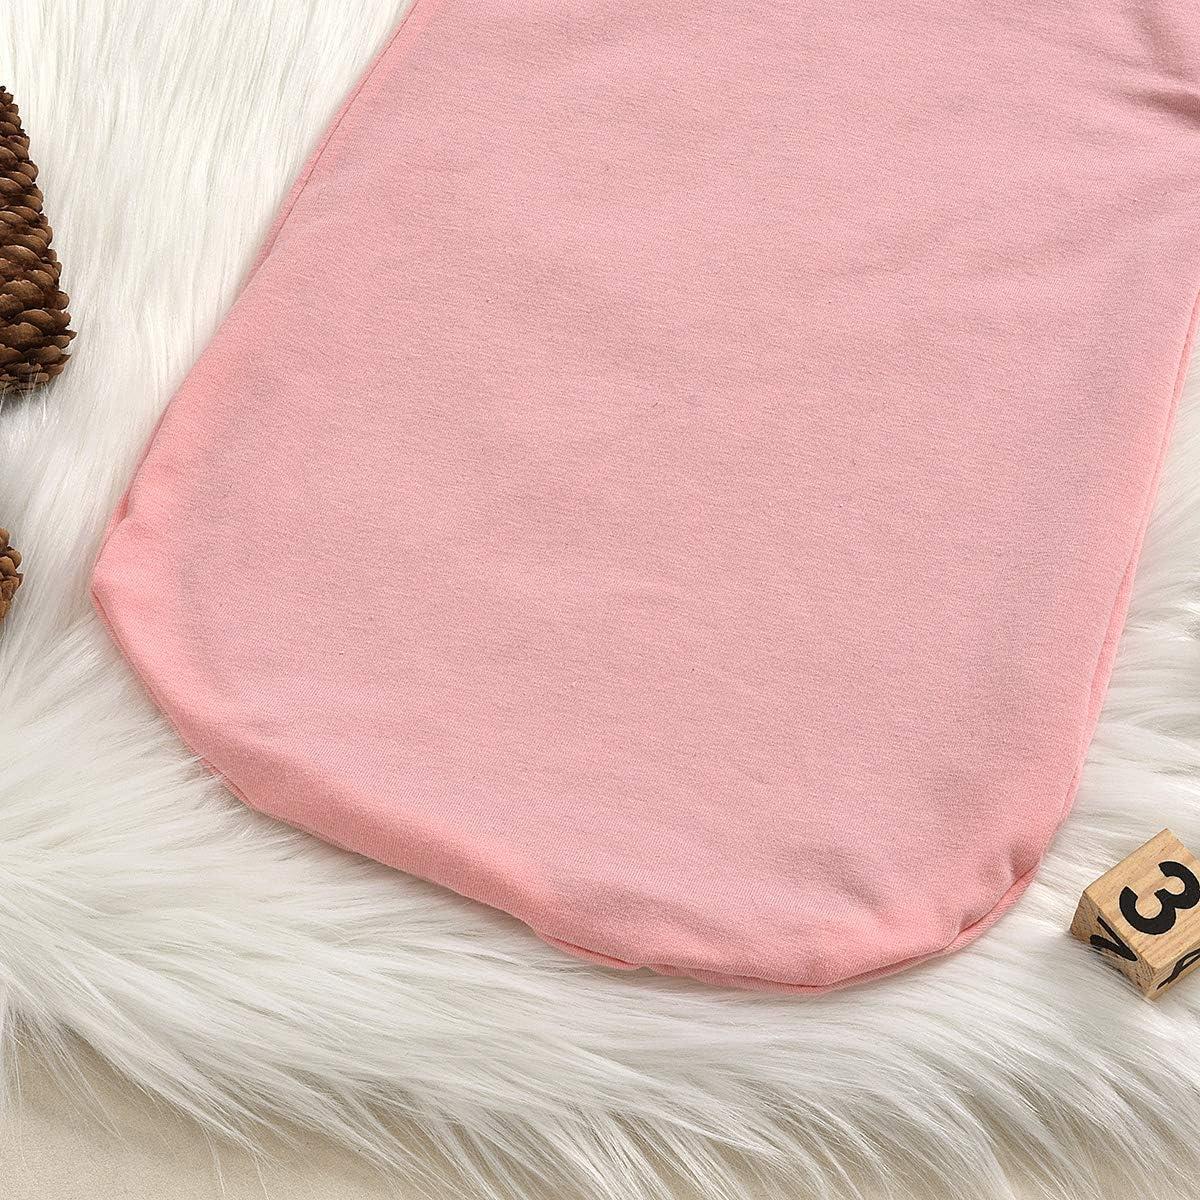 puseky Baby Cute Bat Sleeping Bag Newborn Hooded Swaddle Blanket Sack Crib Wrap for Boys and Girls